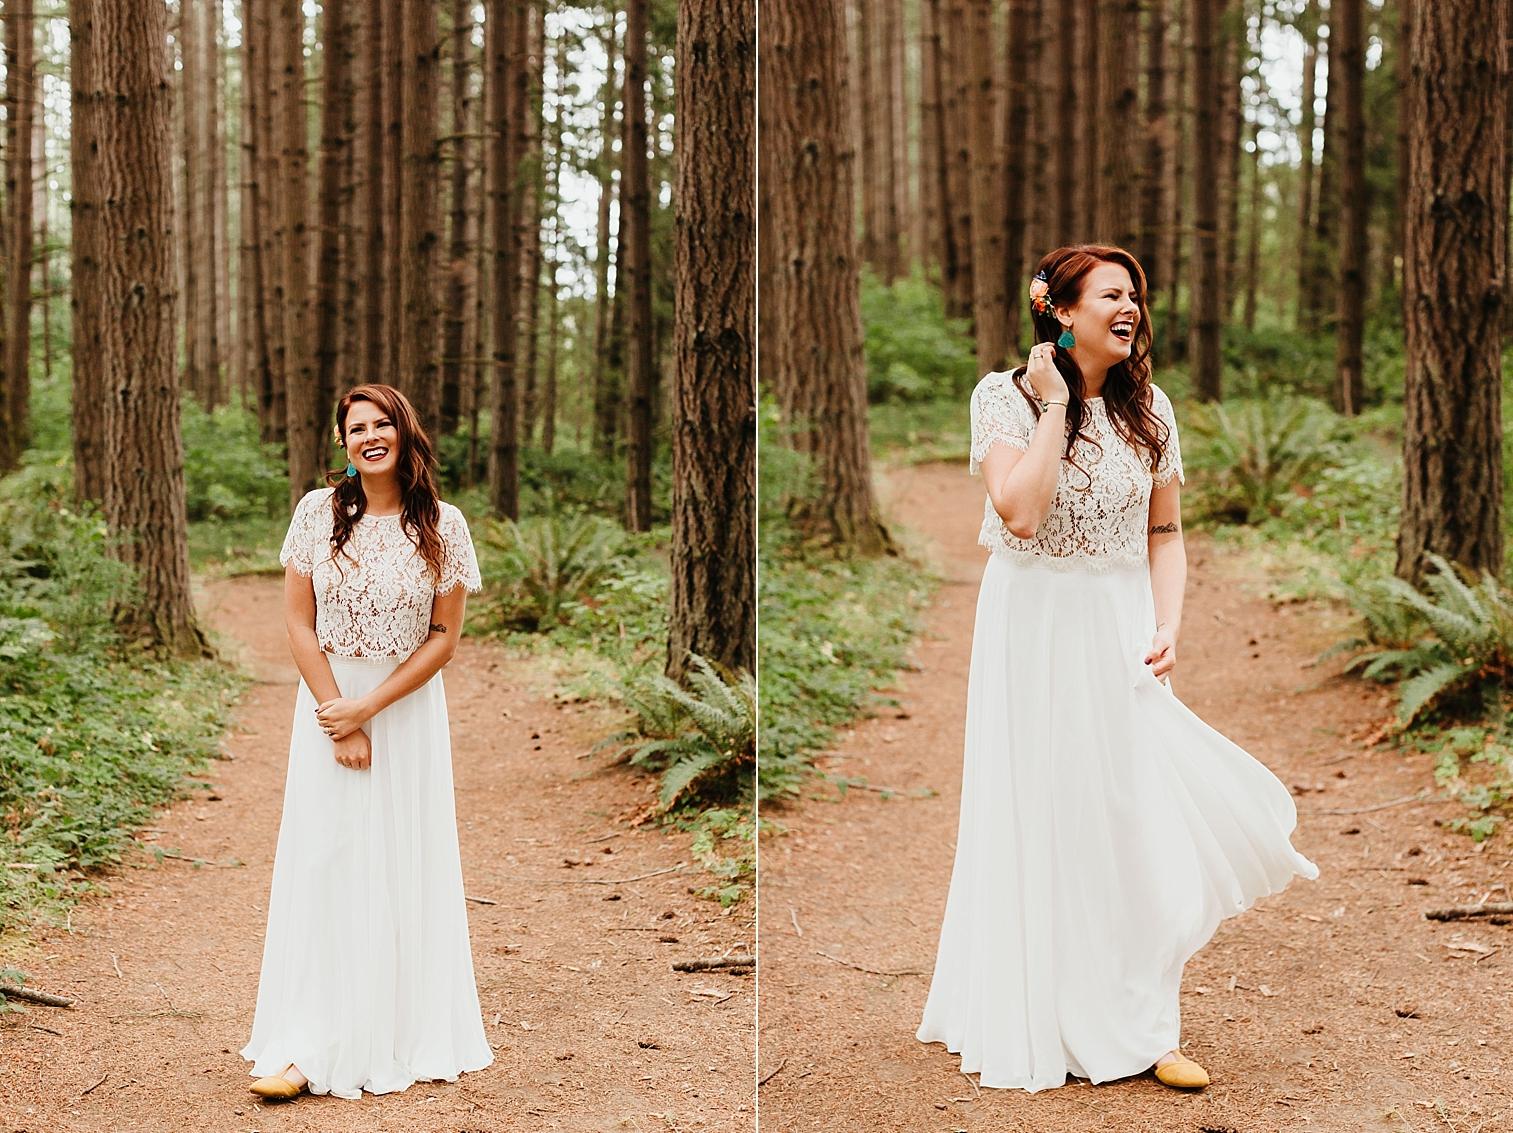 Summer-Camp-Themed-Wedding-31.jpg